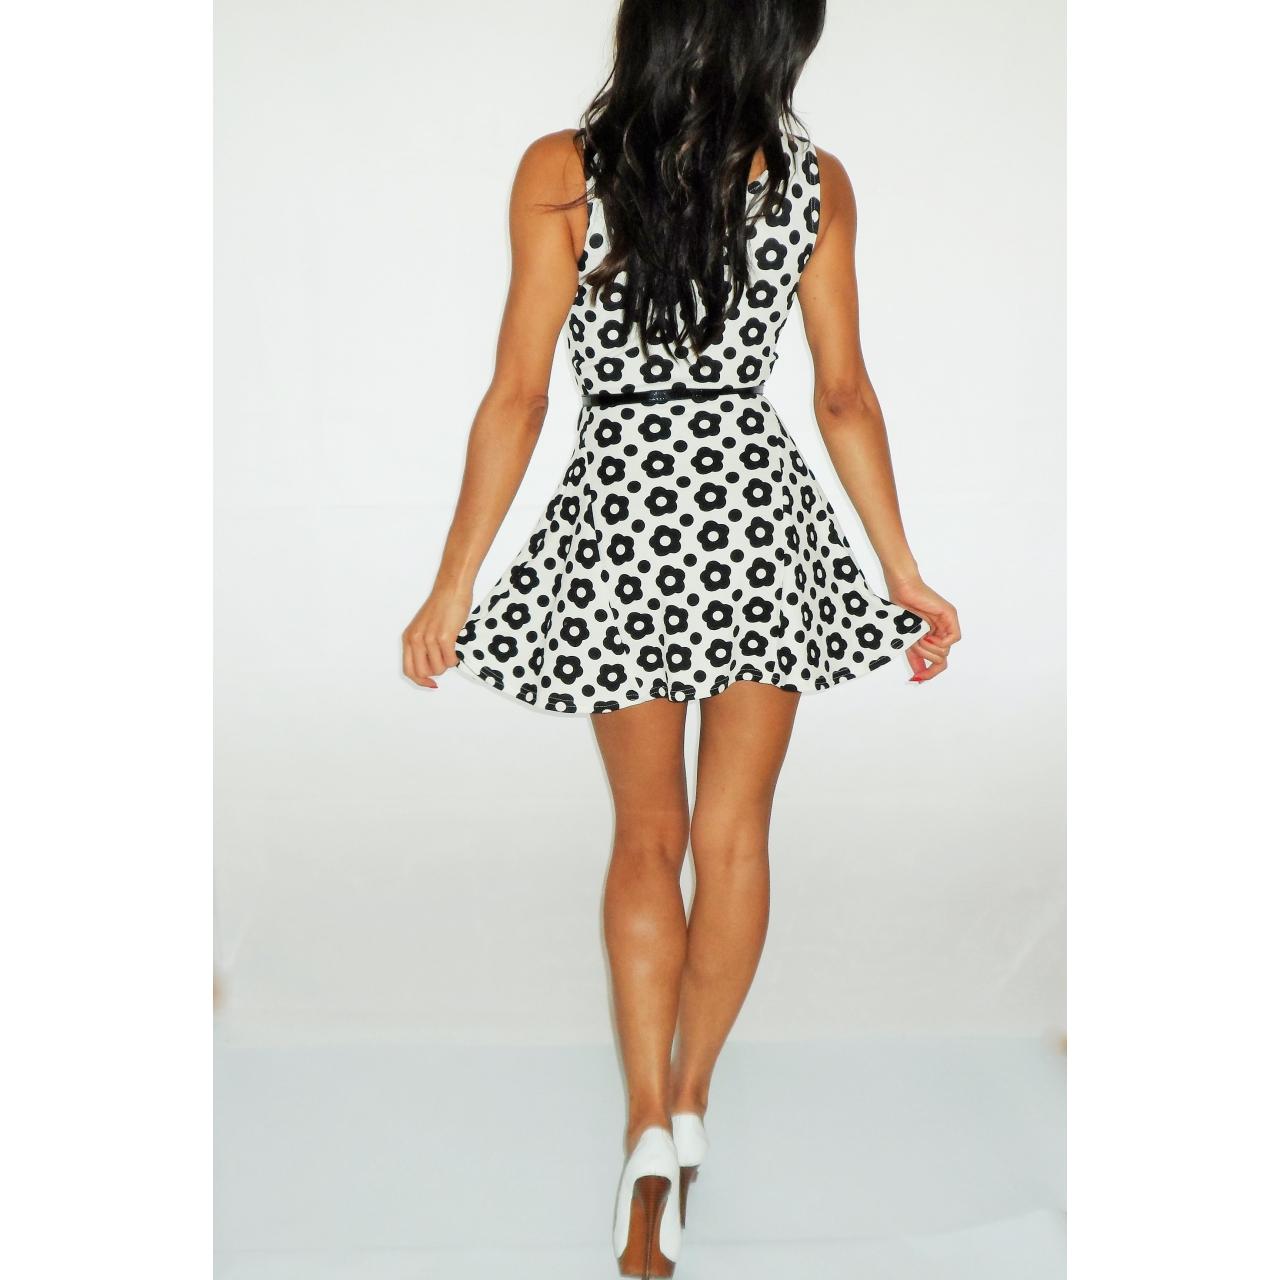 Black And White Flower Print Skater Dress Rocka Frock